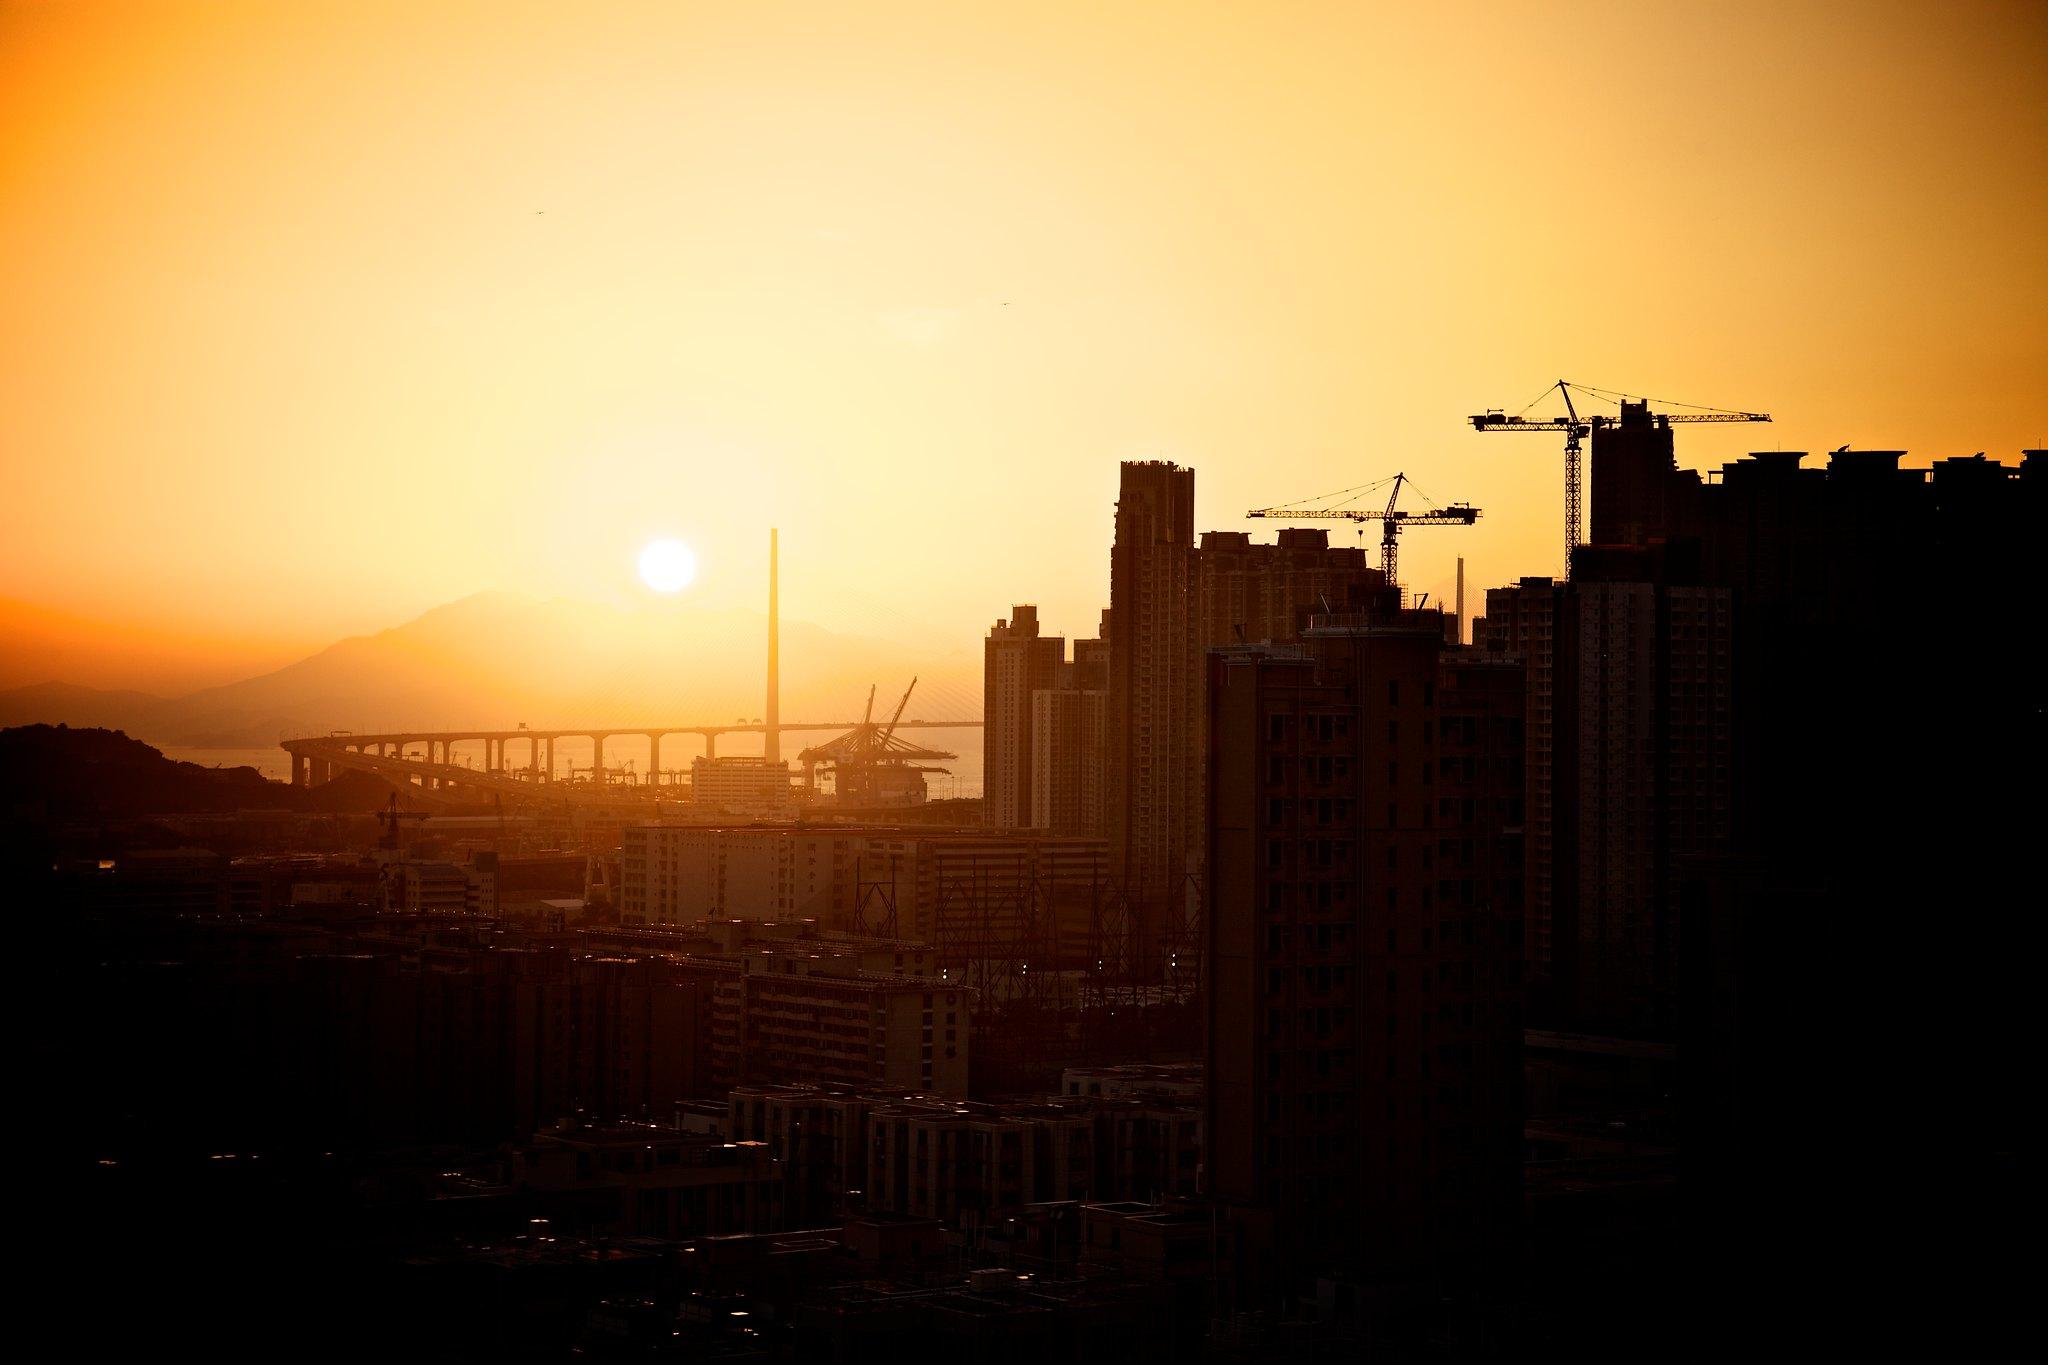 深水埗 - 作品藝廊 - 攝影學堂 - 電腦領域 HKEPC Hardware - 全港 No.1 PC討論區